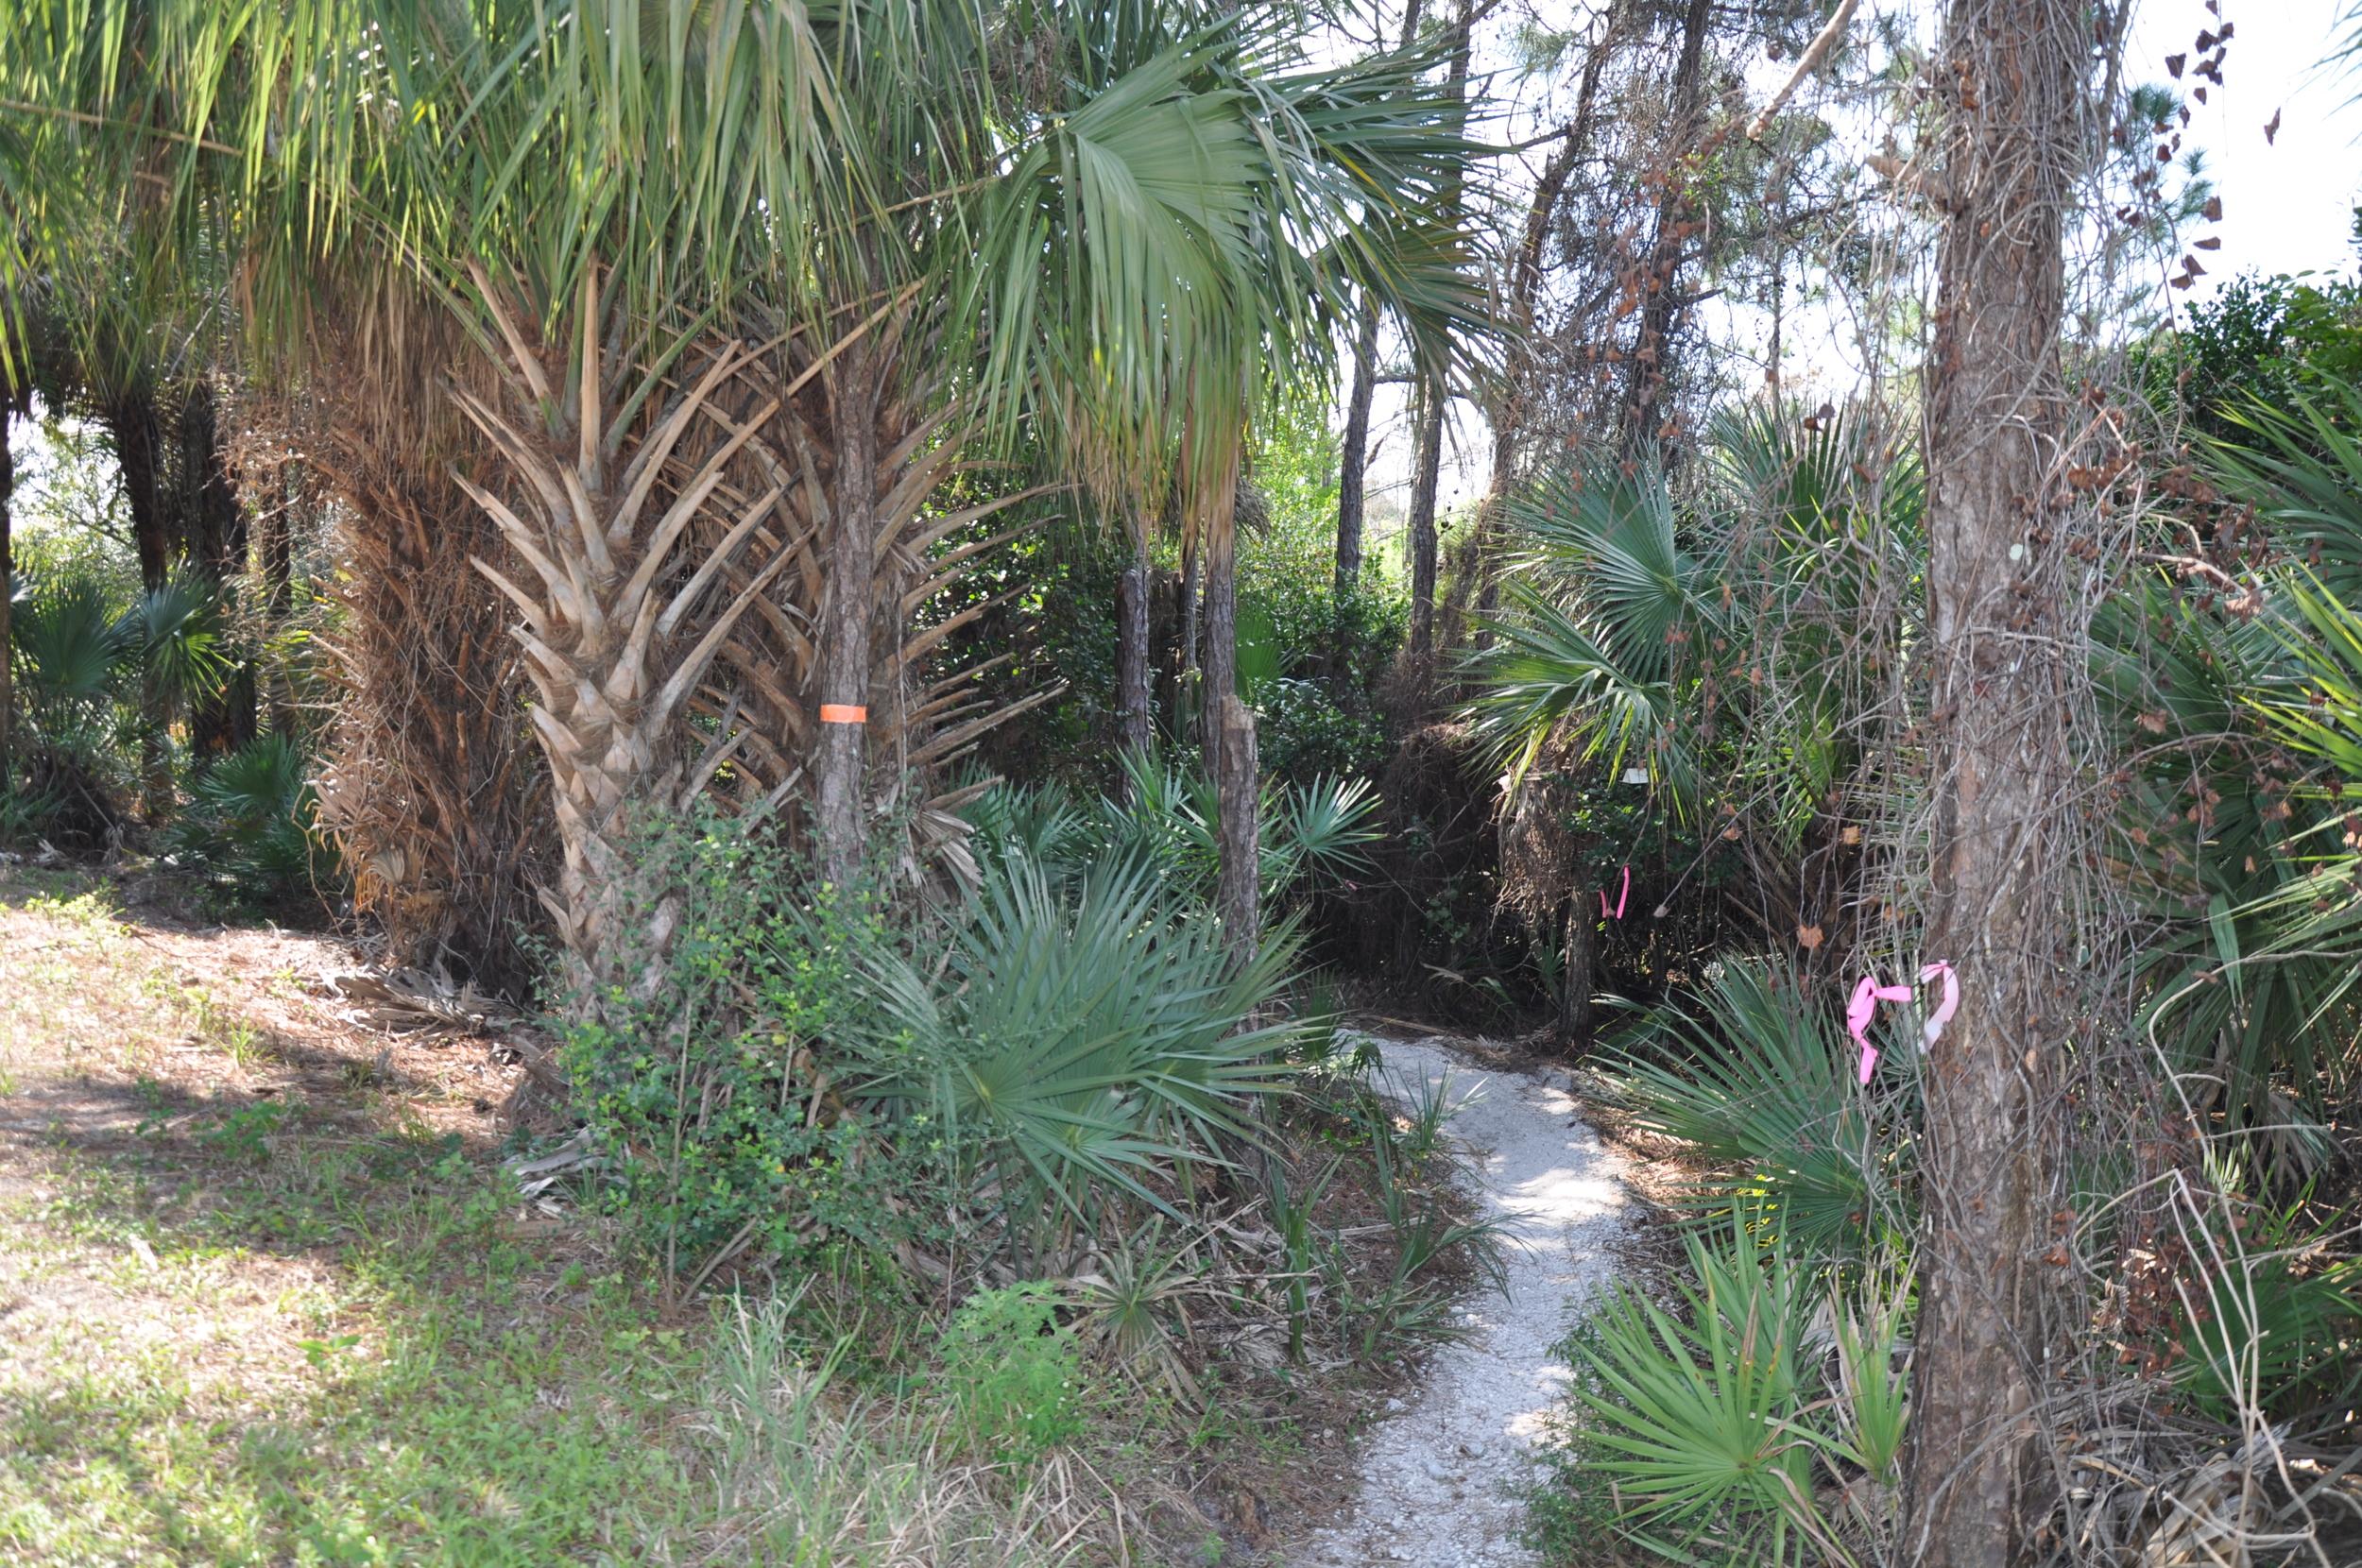 Dyer Landfill Reclamation Palm Beach County Florida Mountain Bike Trail.JPG